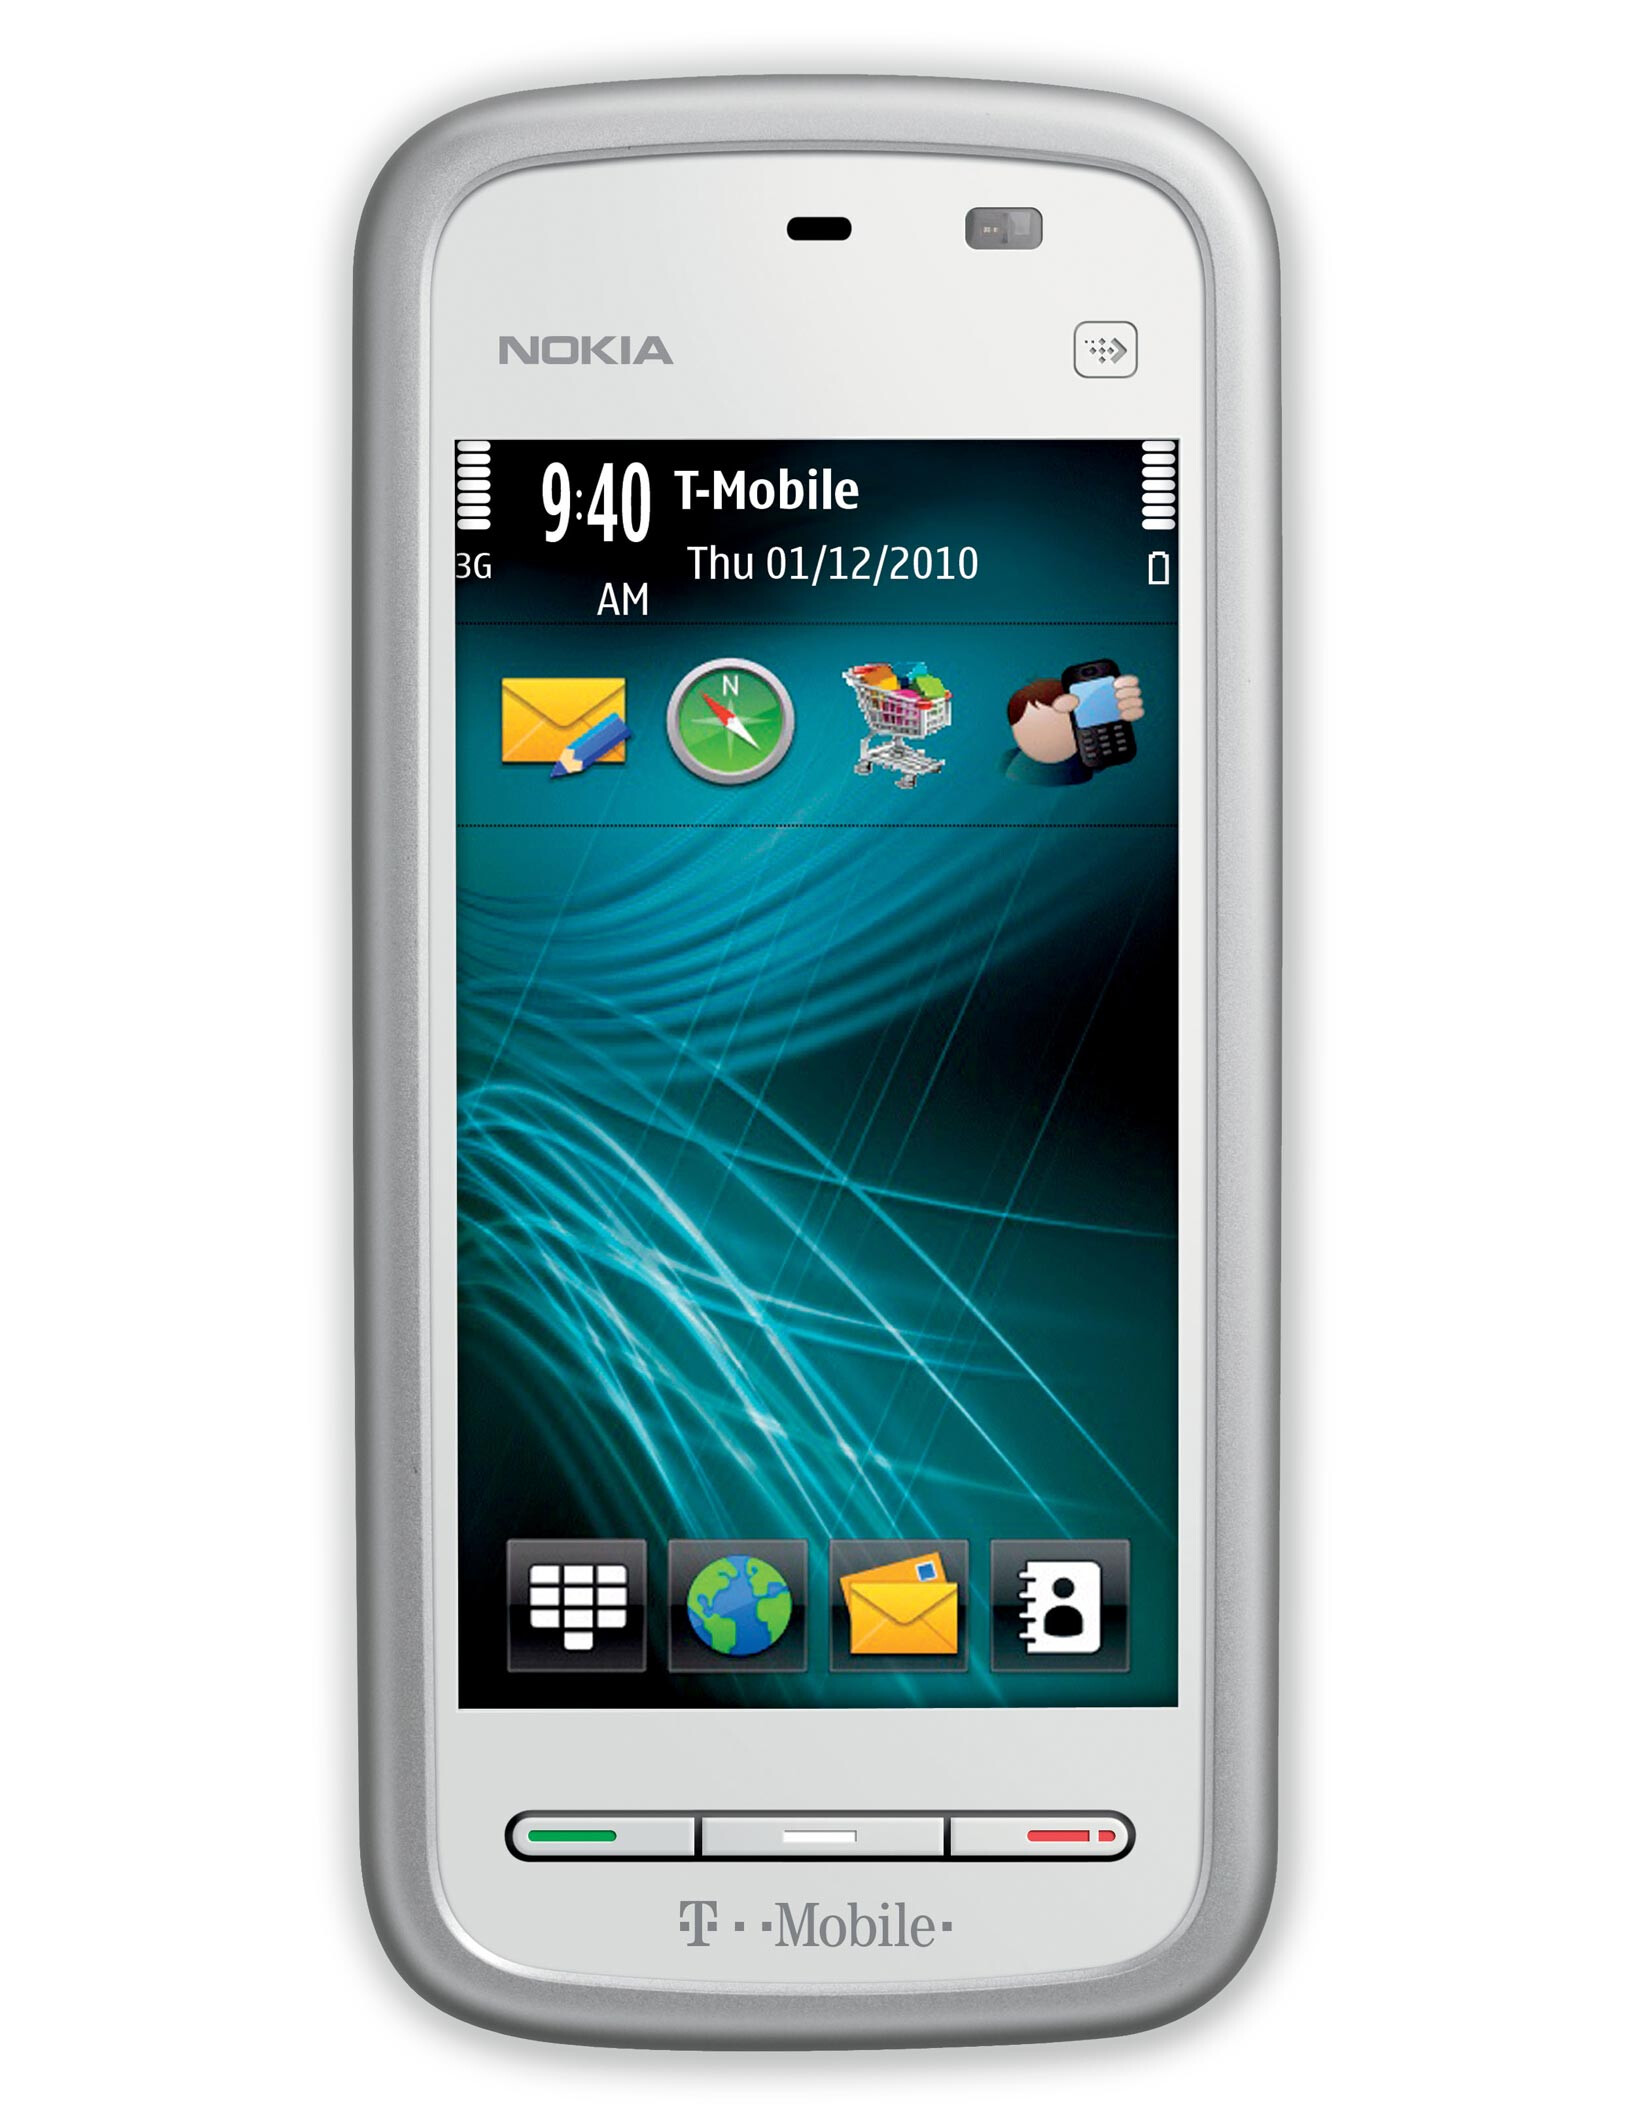 nokia 5230 nuron photos rh phonearena com Nokia 5320 Nokia 6300